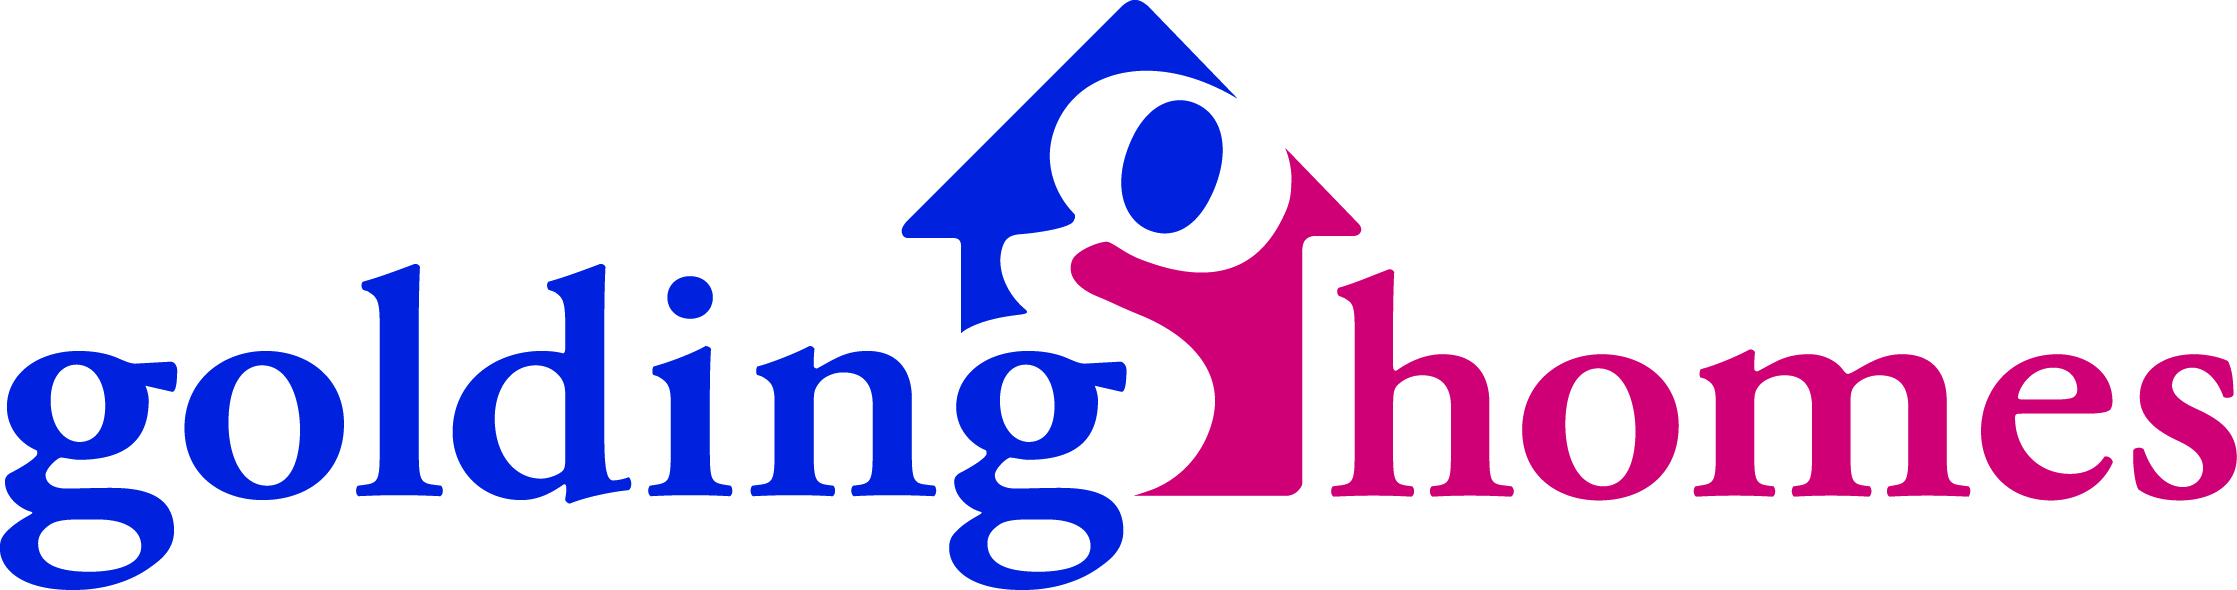 Golding-Homes-logo-MITIE-story-fmj-oct-12.jpg